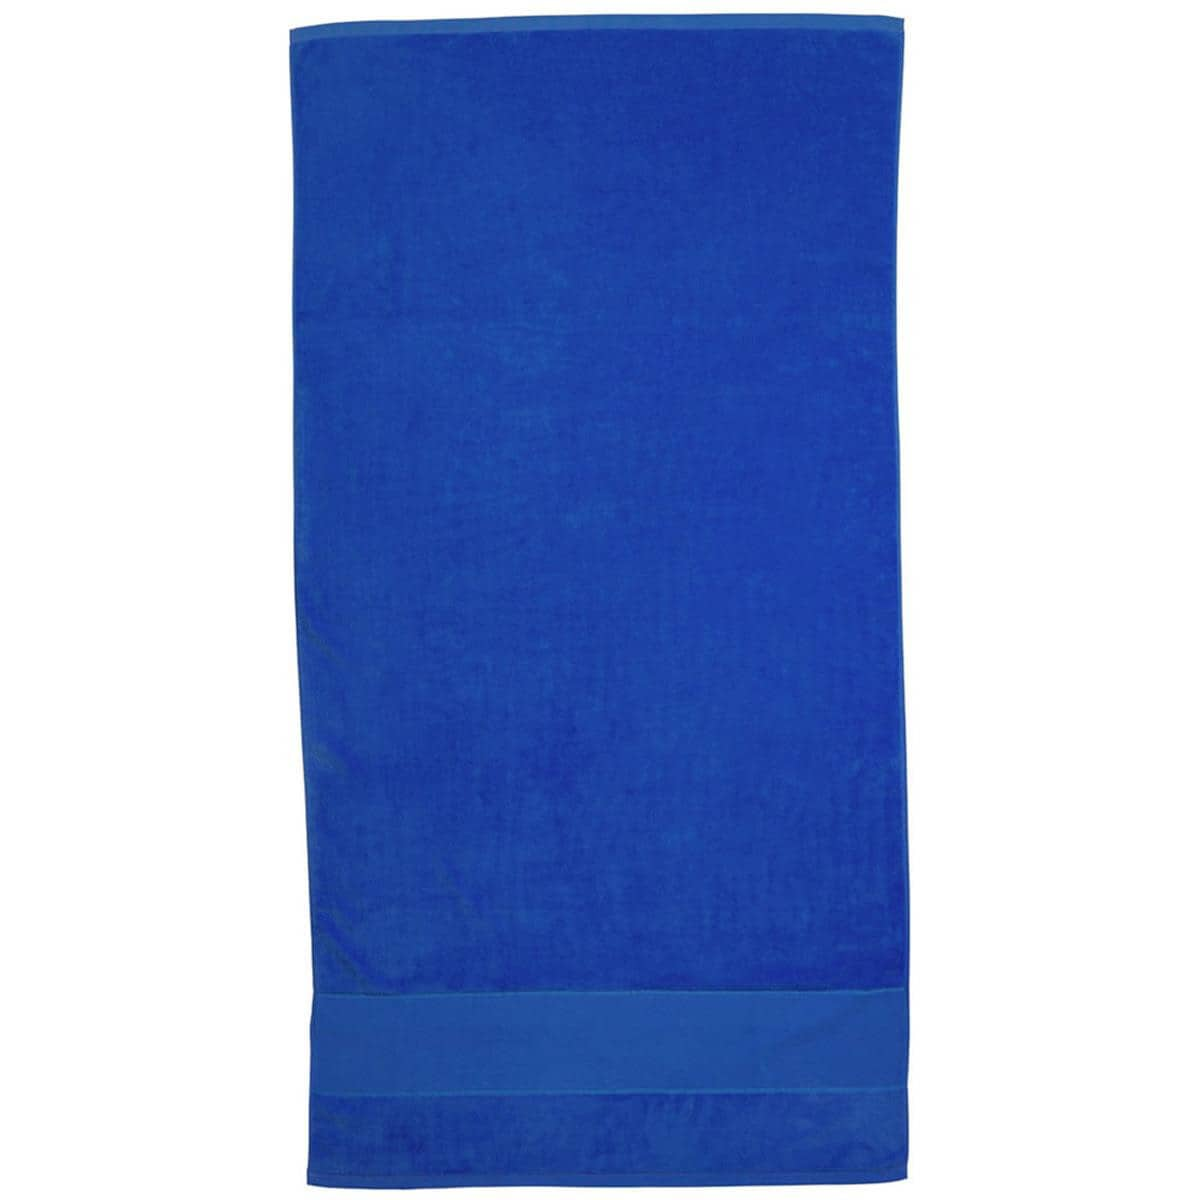 Royal Blue Super Soft Touch Towel Custom Printed